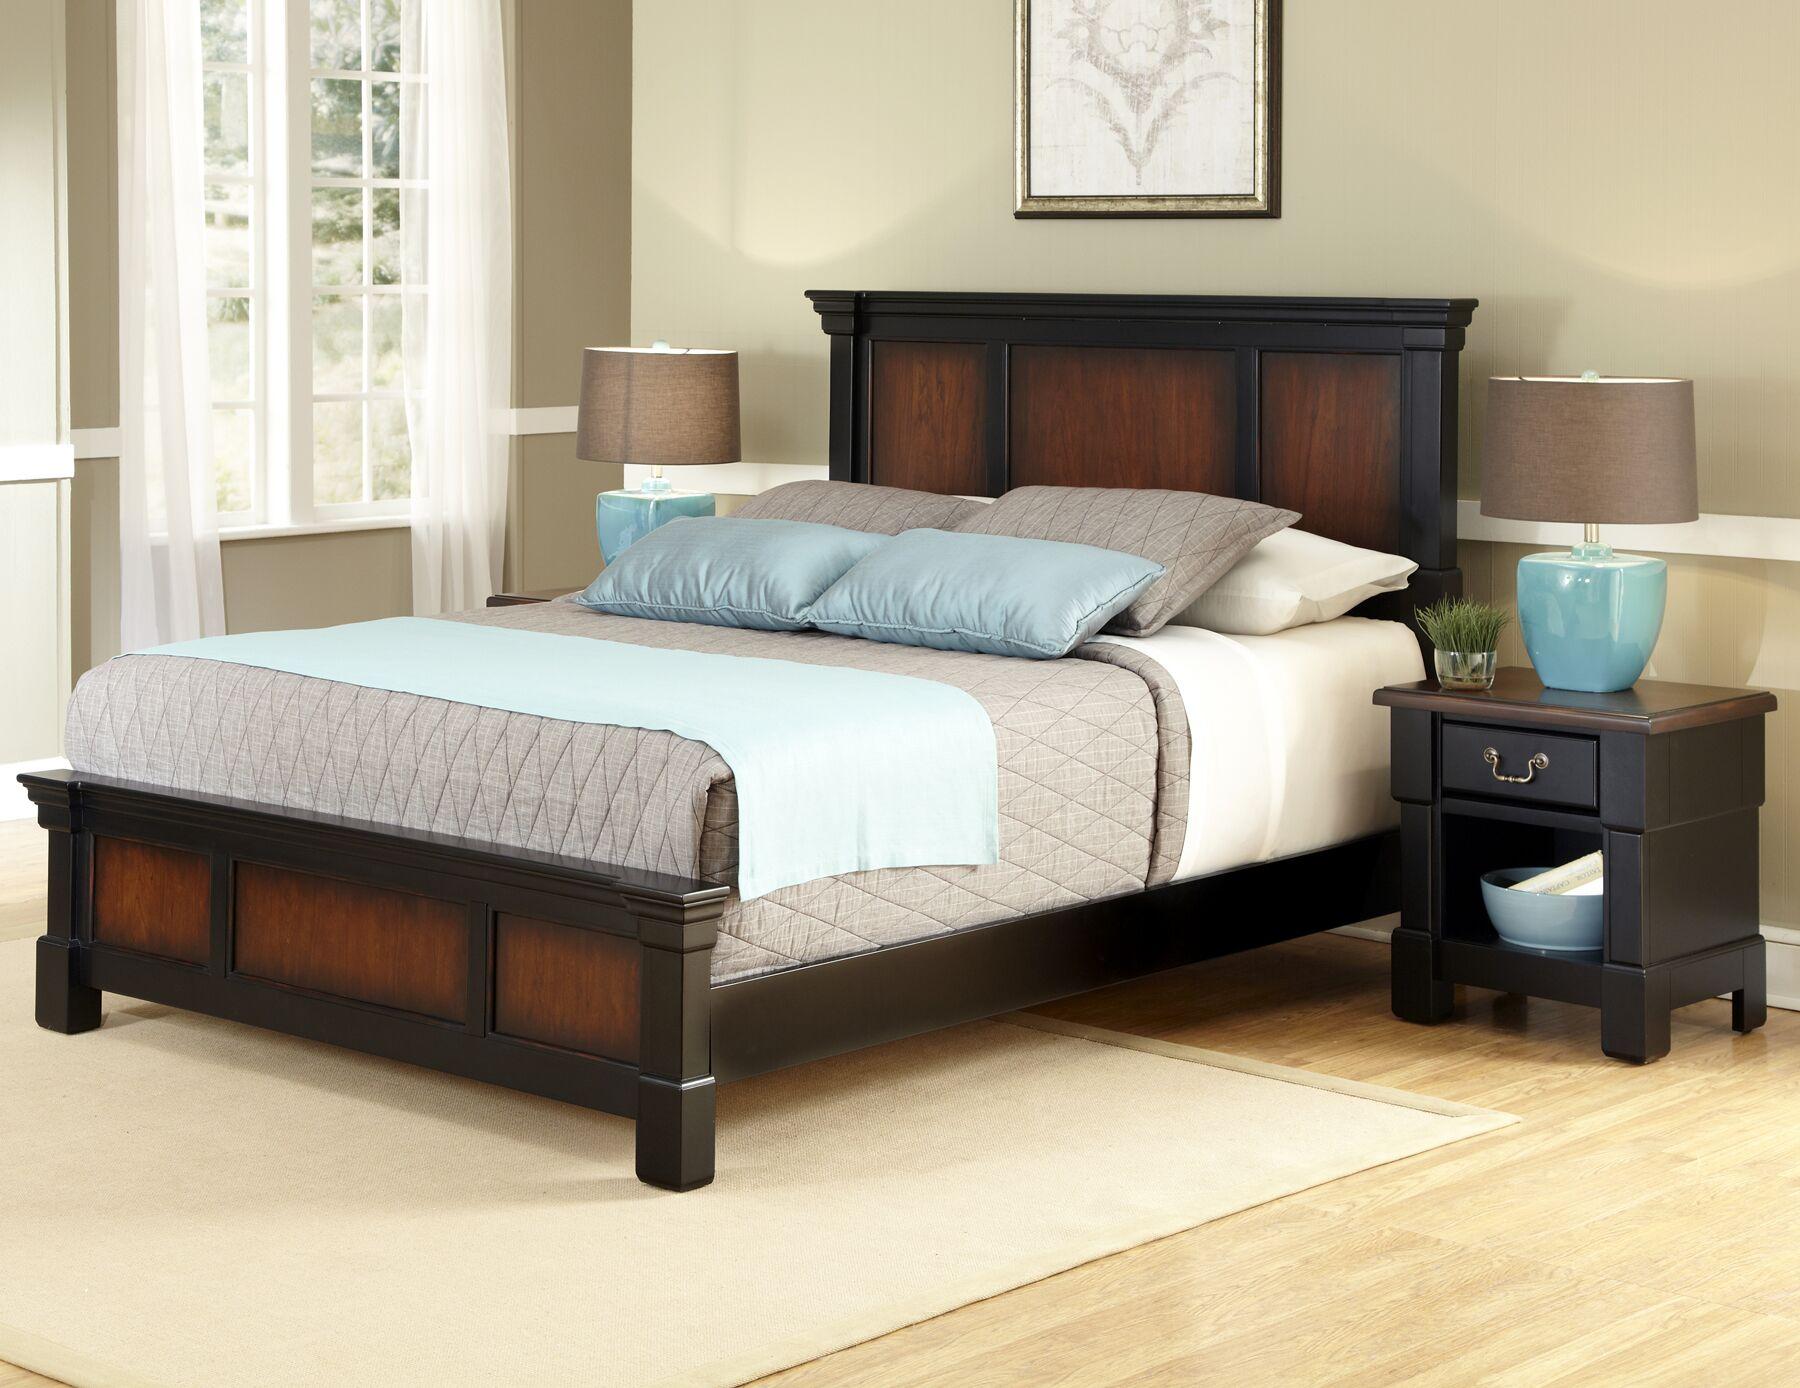 Cargile Panel 2 Piece Bedroom Set Size: Queen, Finish: Rustic Cherry / Black